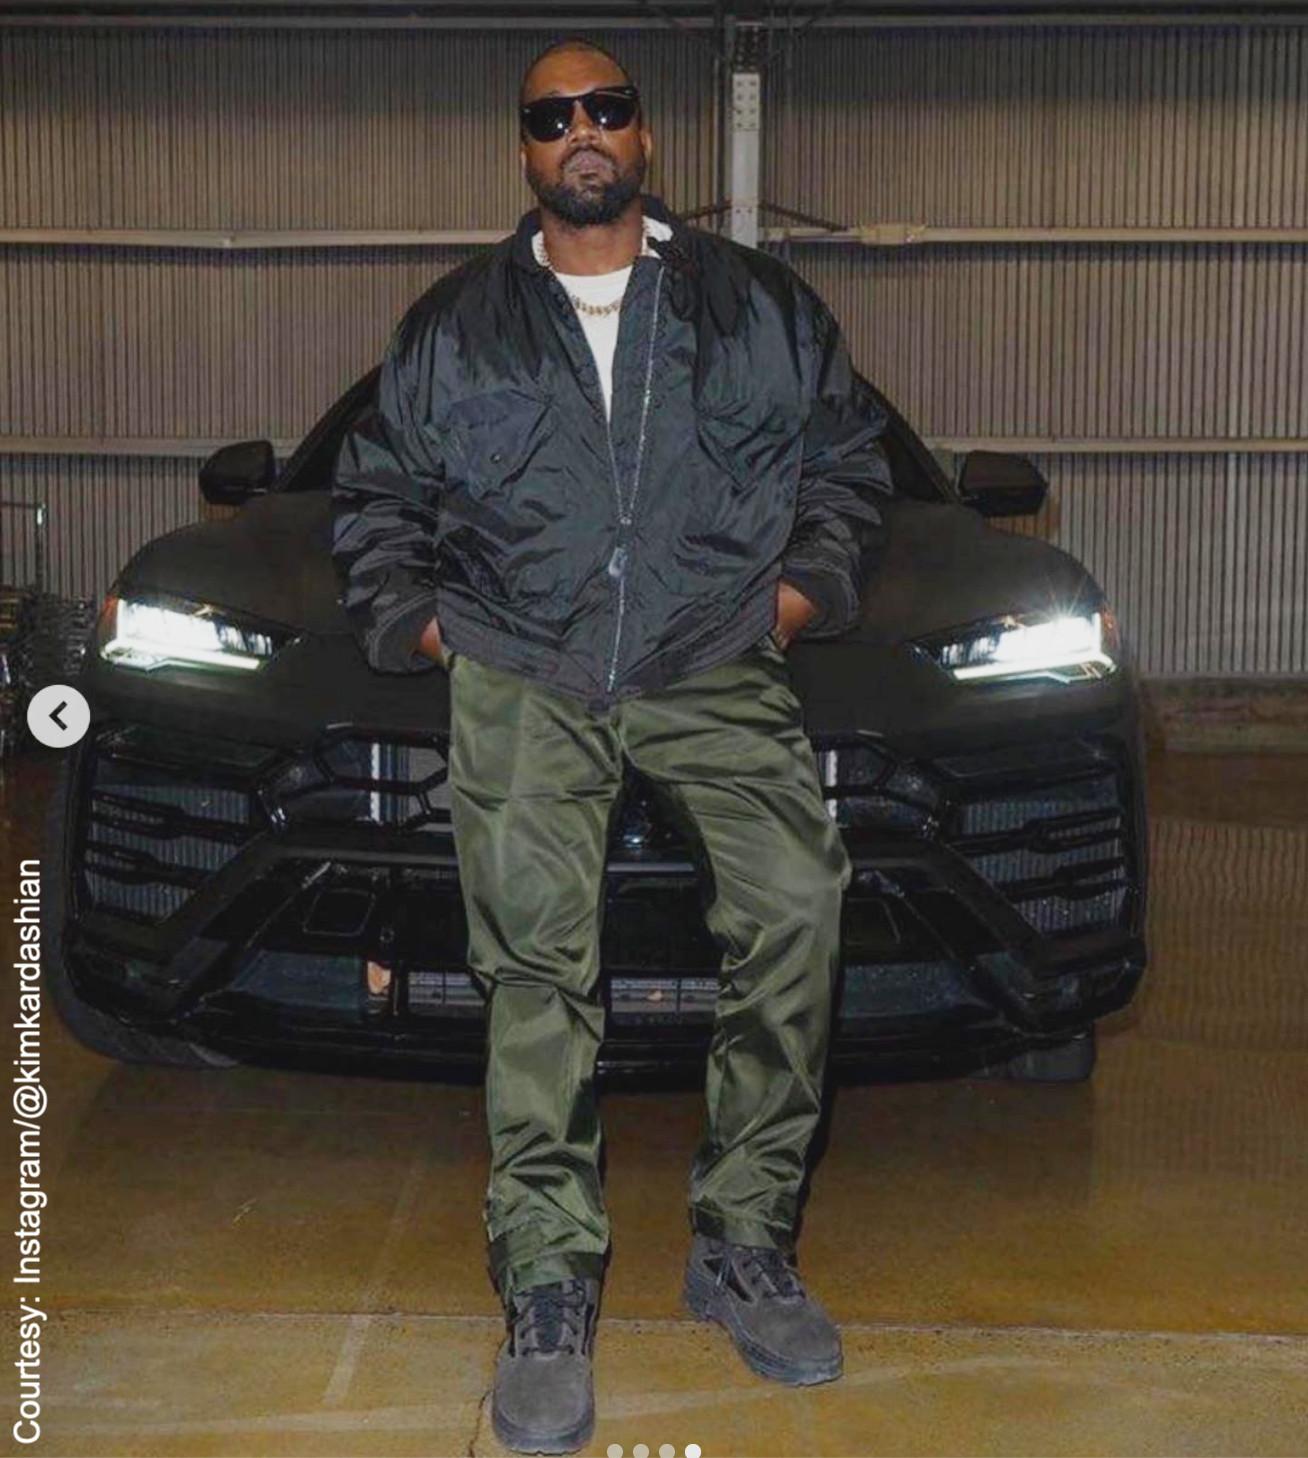 Kanye West Instagram photo